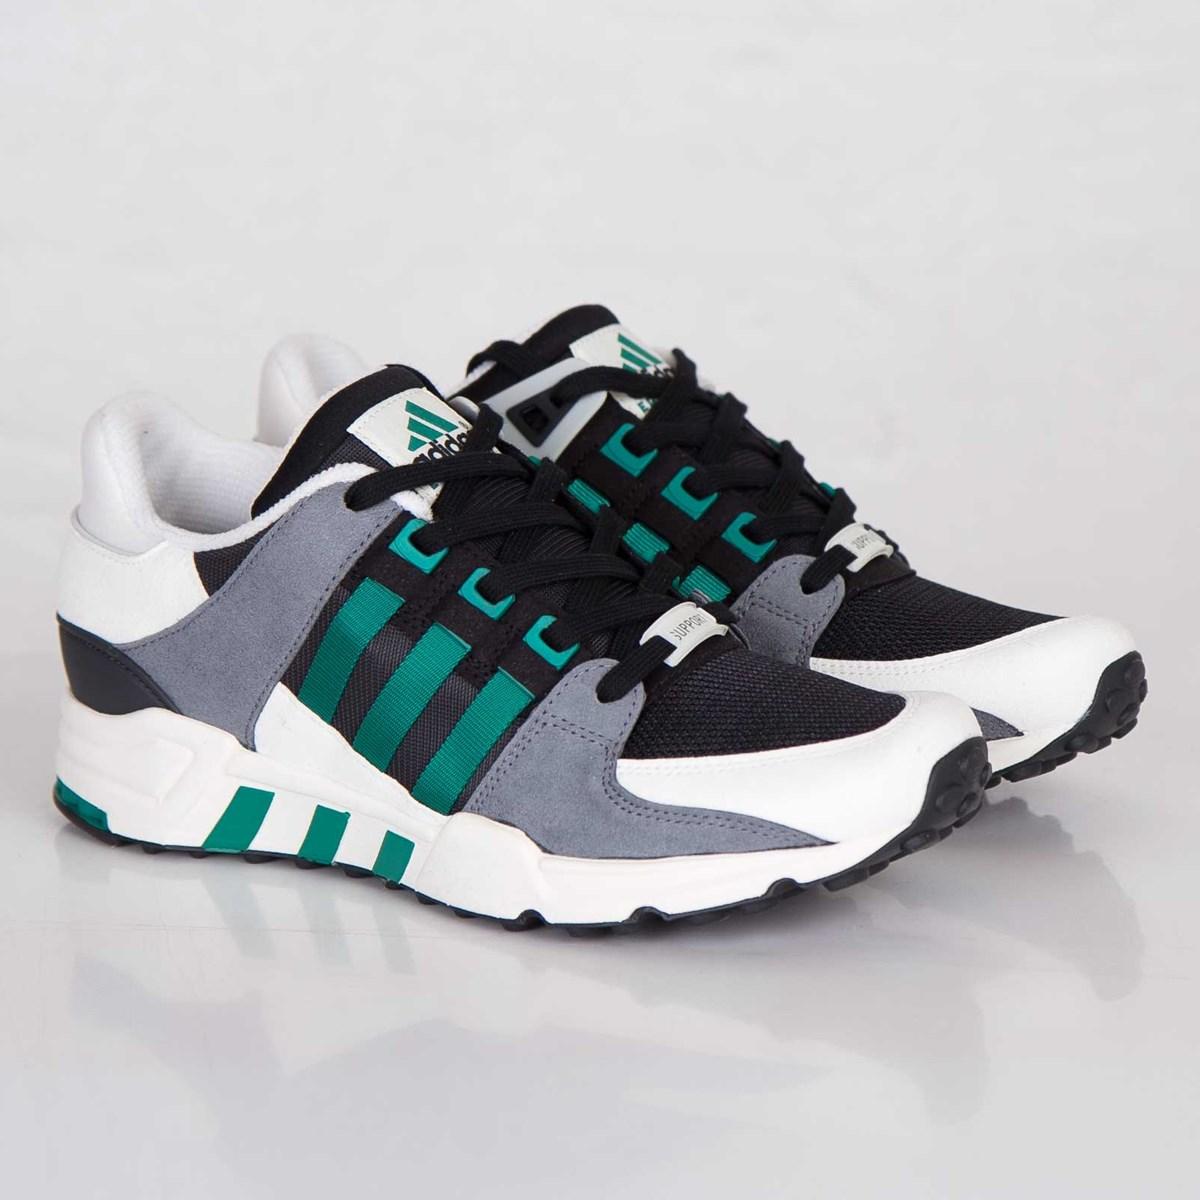 despensa Interprete tabaco  adidas EQT Running Support - D67729 - Sneakersnstuff | sneakers &  streetwear online since 1999